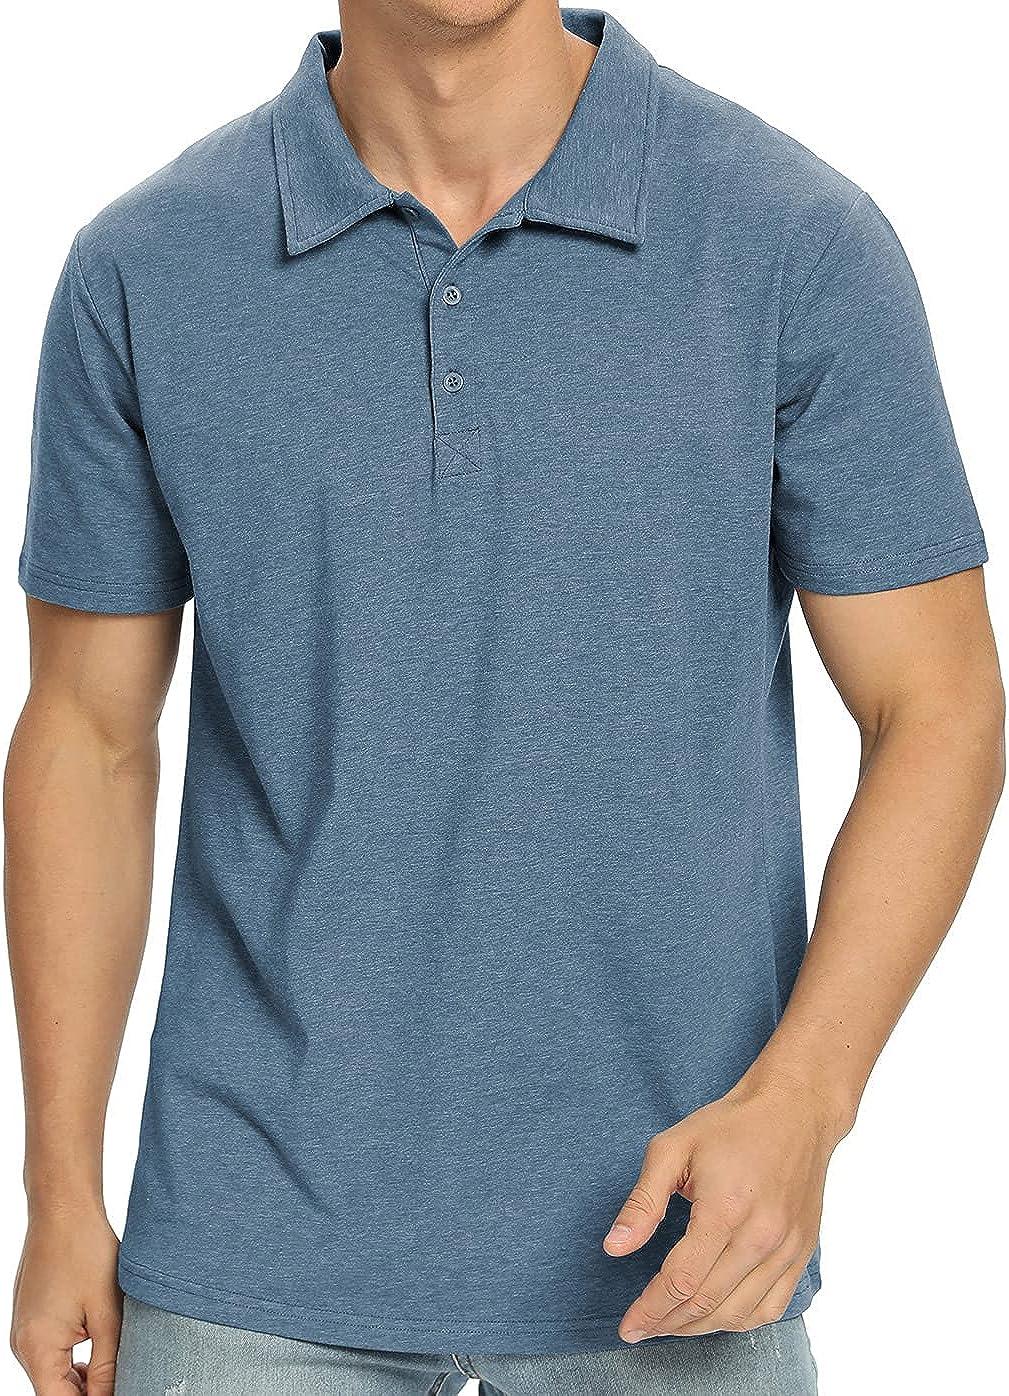 NITAGUT Men's Short Sleeve Solid Premium Cotton Jersey Polo Shirt